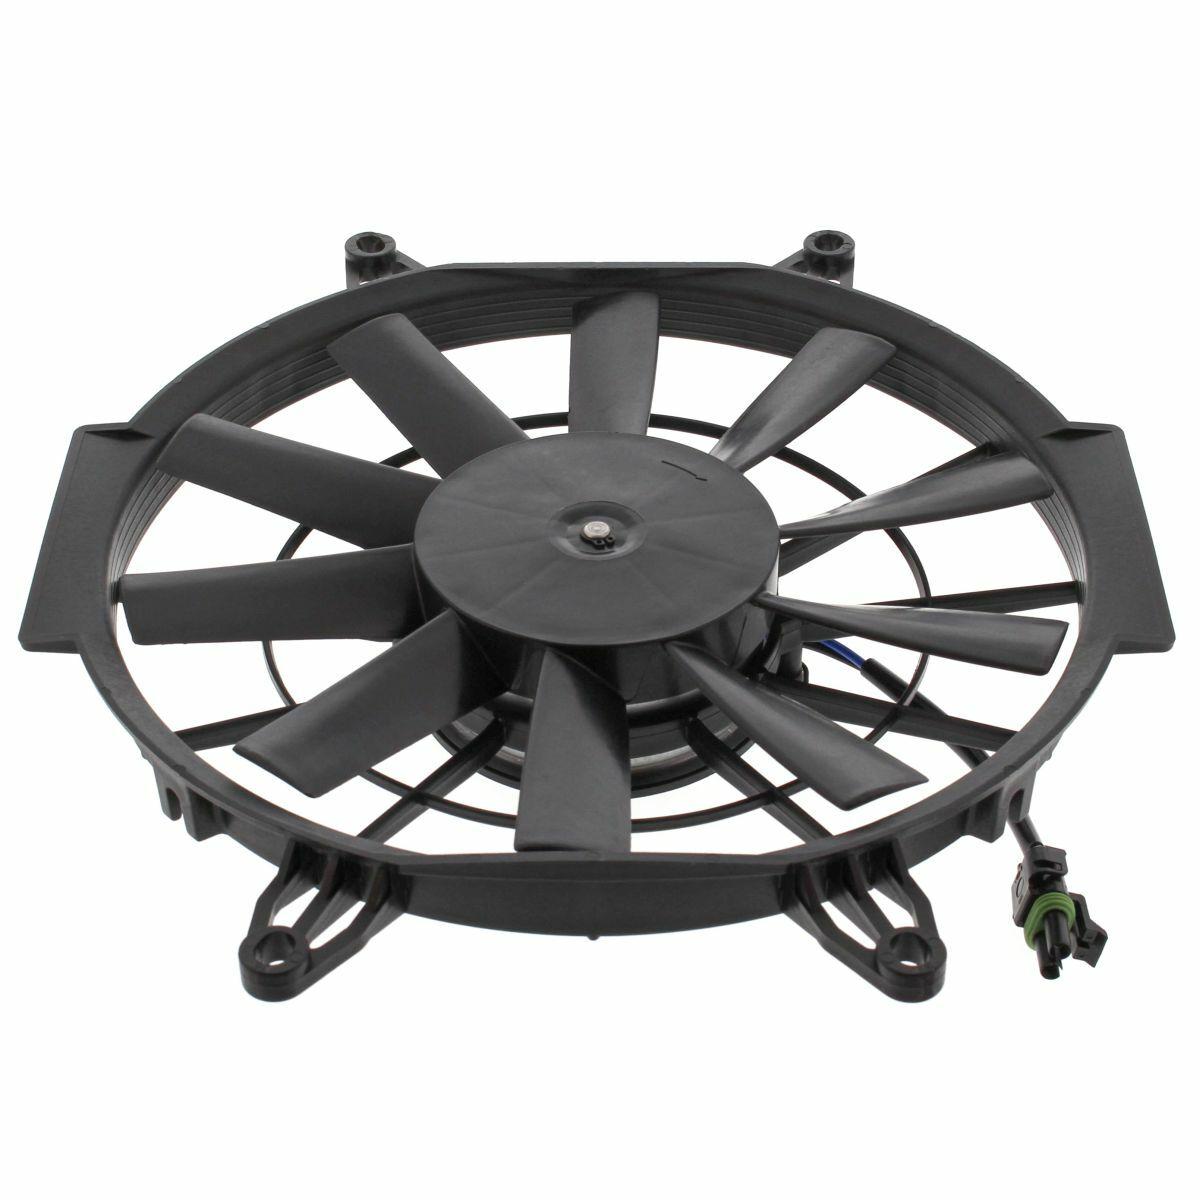 Obrázek produktu Ventilátor chladiče All Balls Racing RFM0004 70-1004